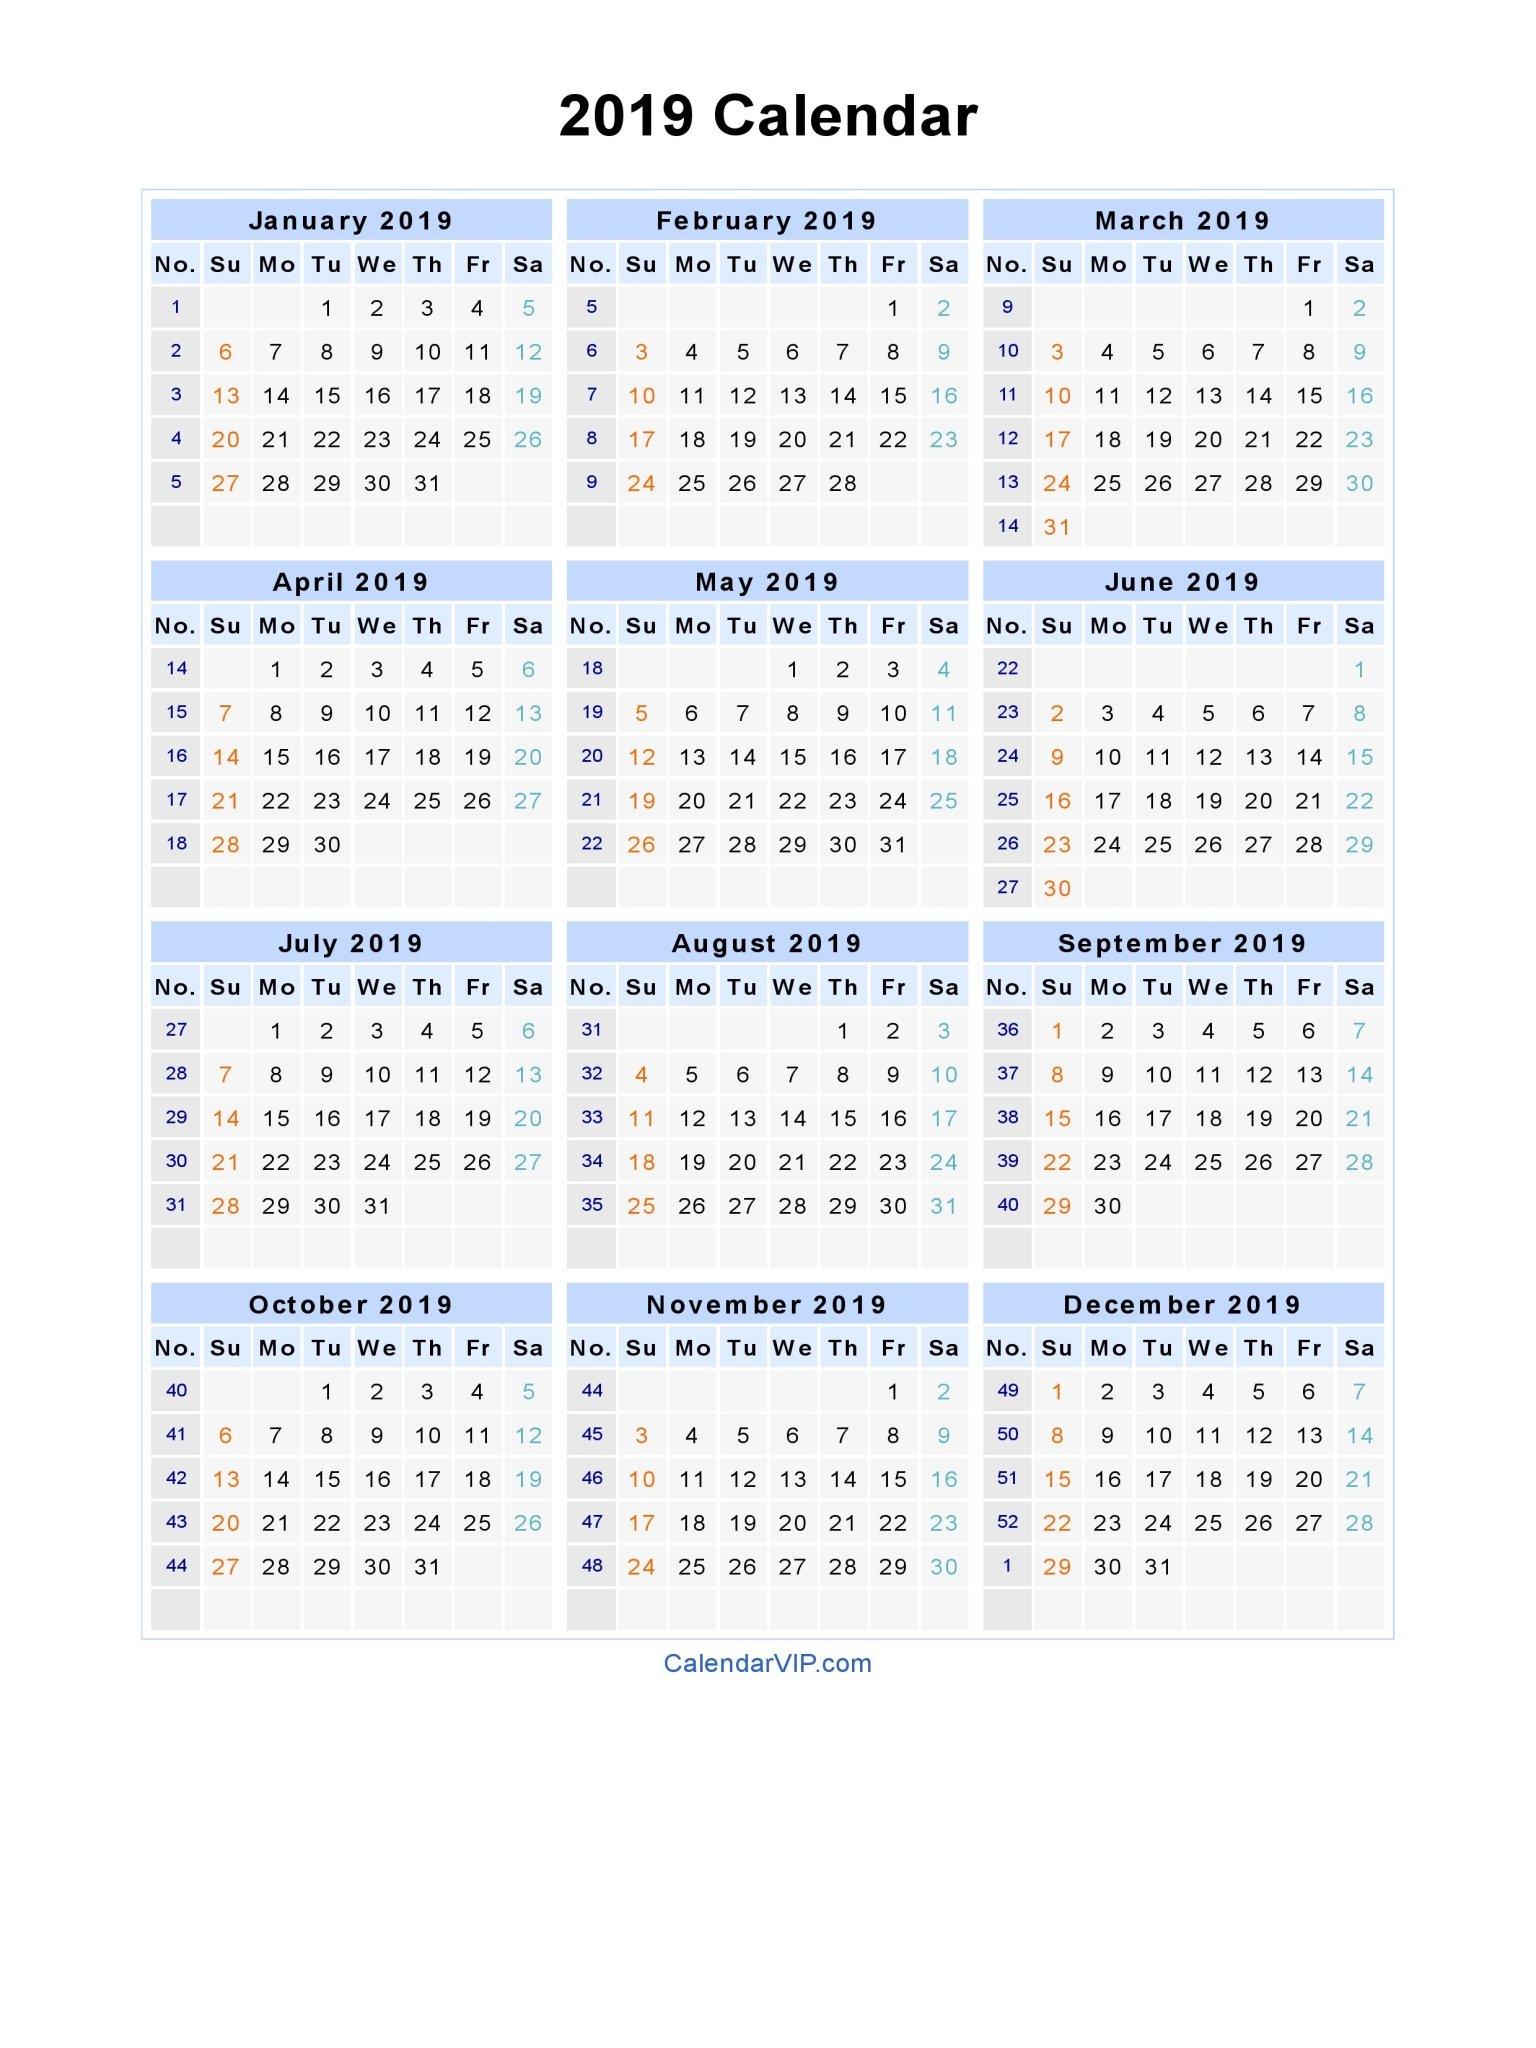 2019 Calendar - Blank Printable Calendar Template In Pdf Word Excel Calendar 2019 Microsoft Word